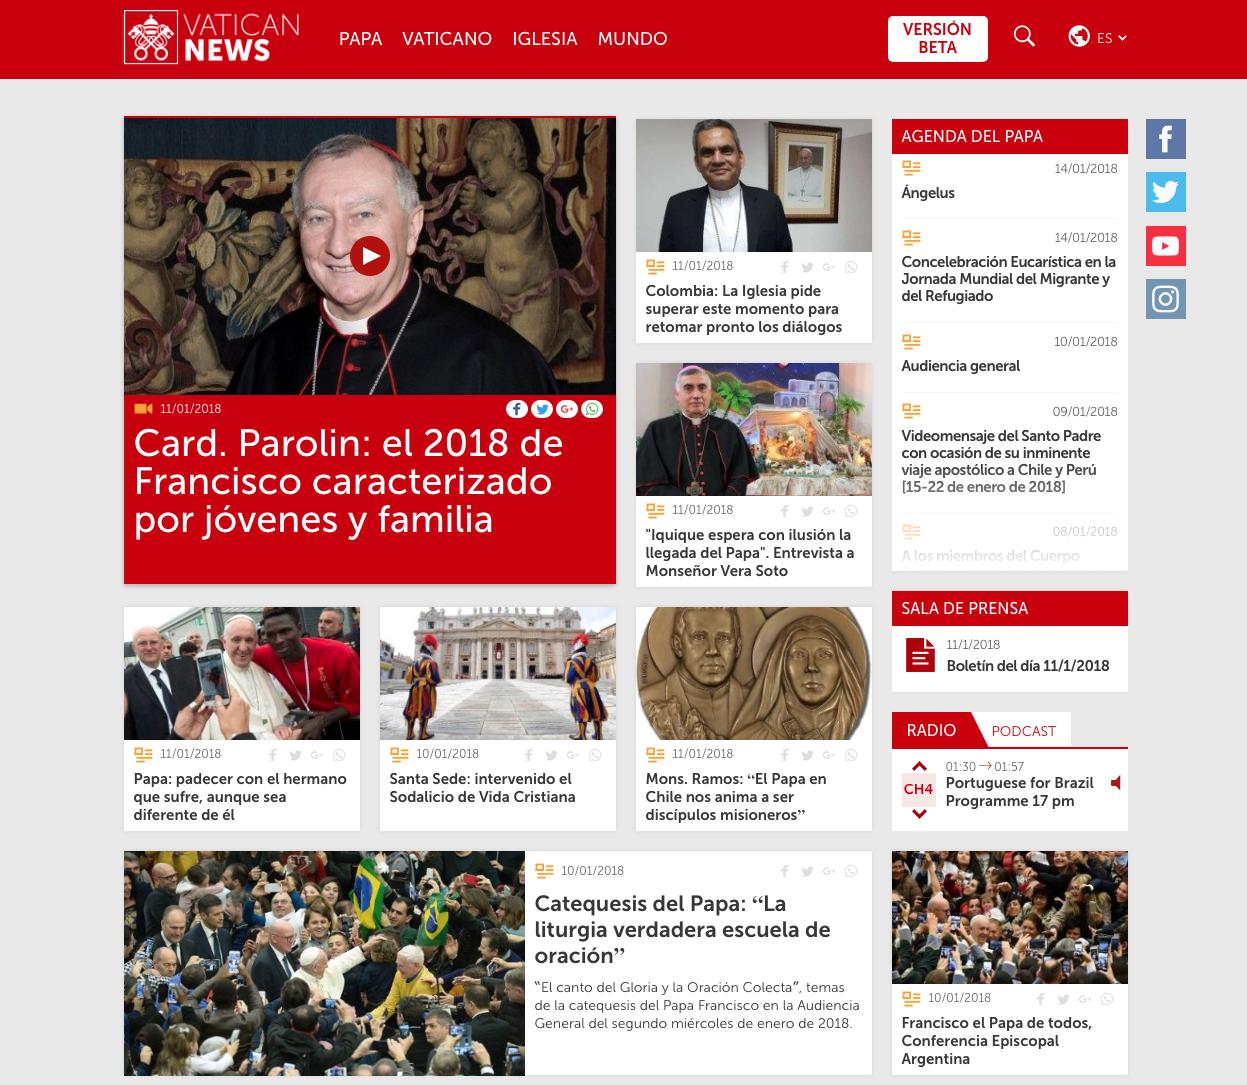 http://www.vaticannews.va/es.html